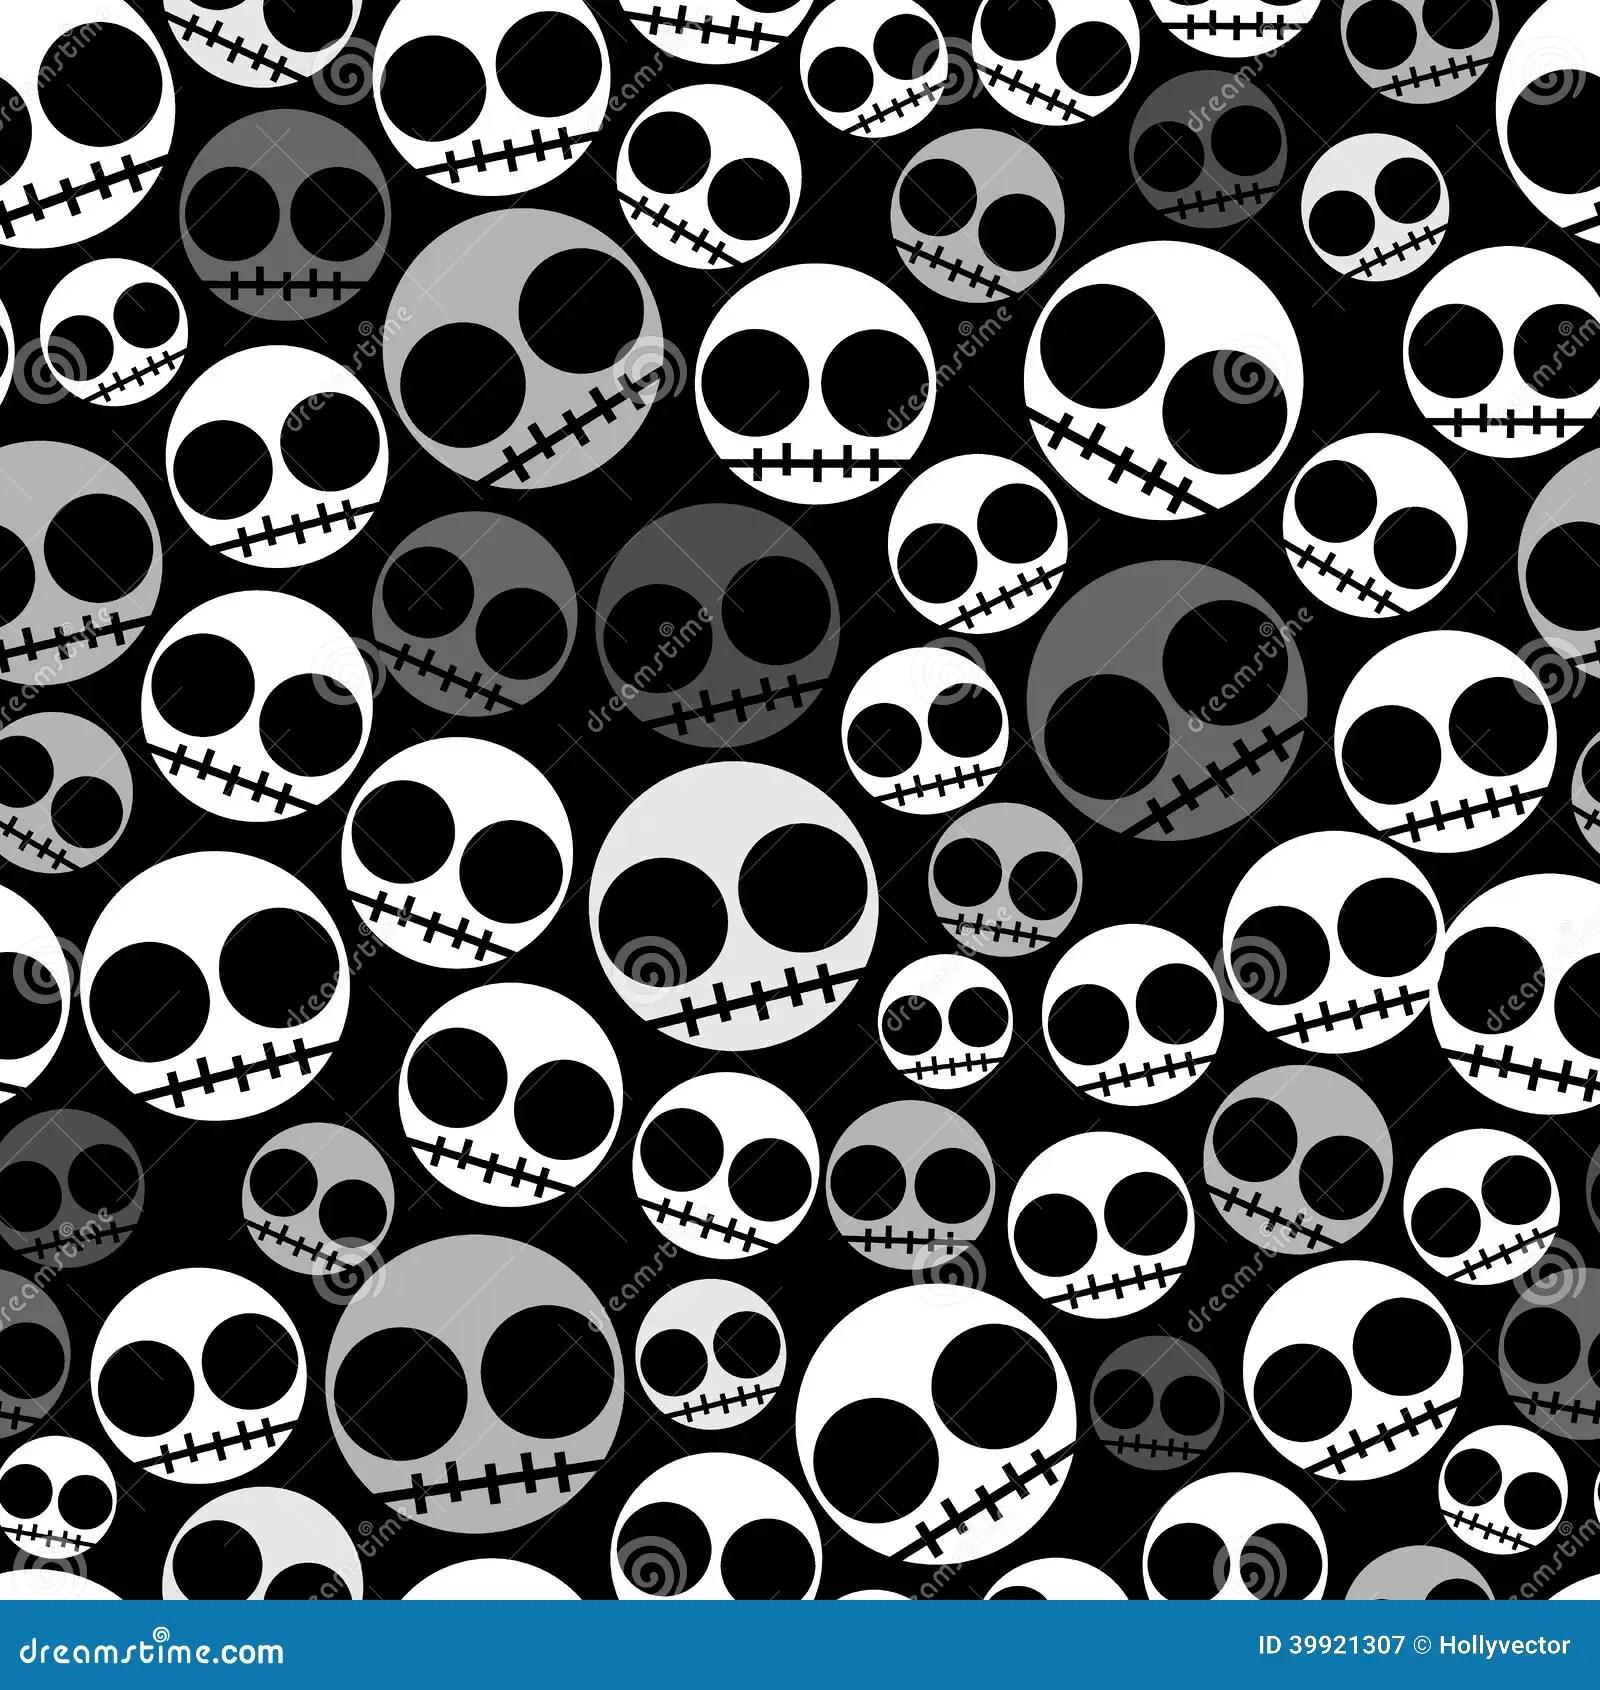 Skeleton Pattern Wallpaper Cute Emo Seamless Pattern Stock Vector Illustration Of Drawing